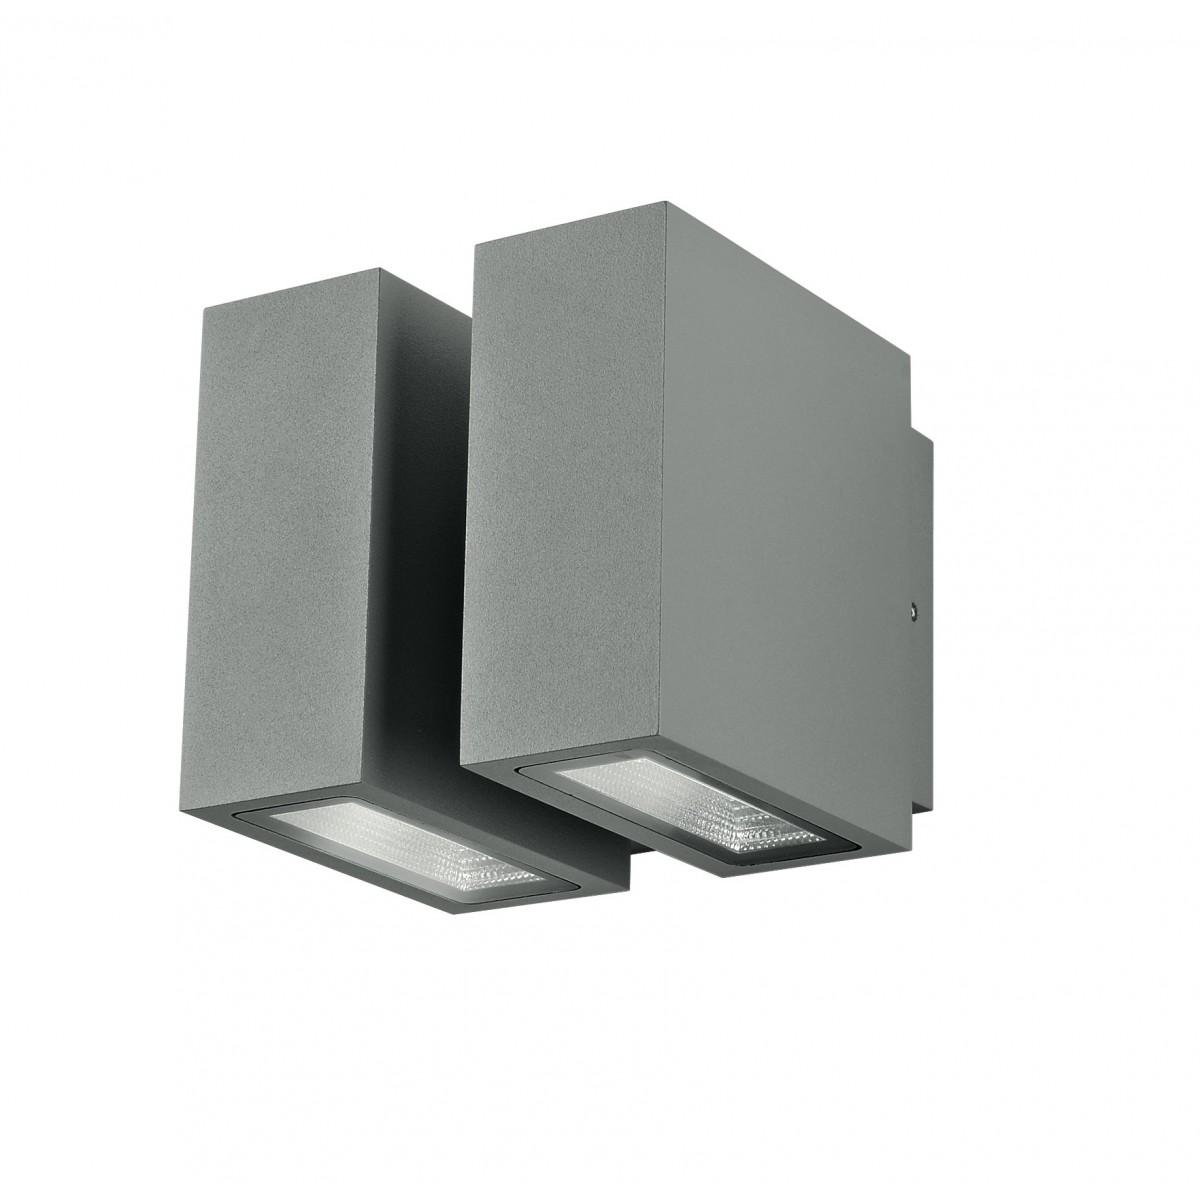 Led beta ap2 applique per esterno luce led bidirezionale - Applique led esterno ...